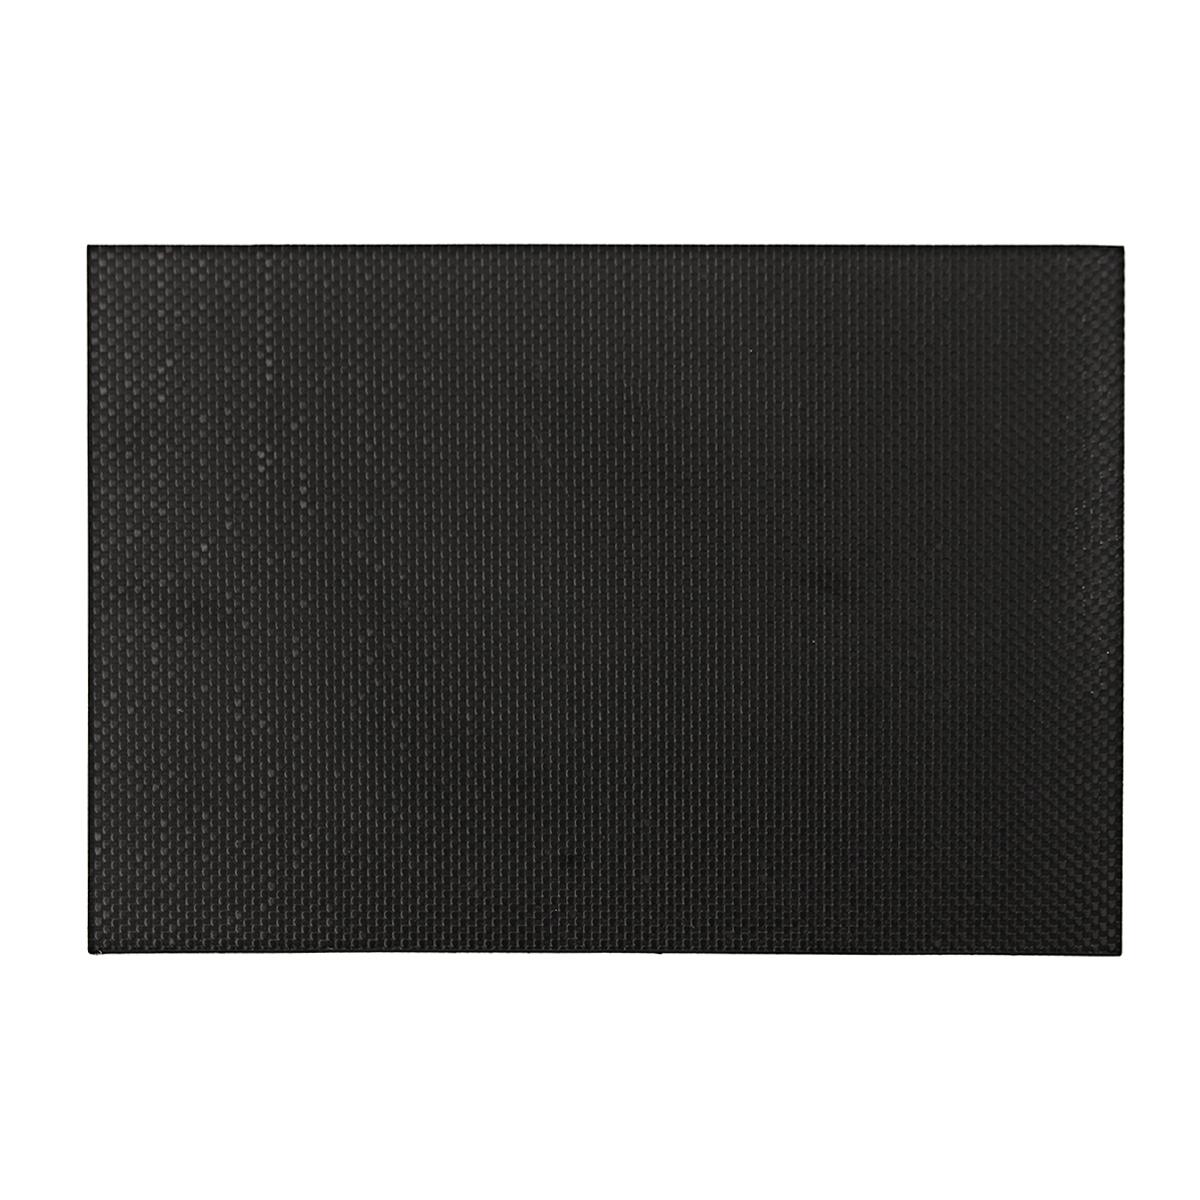 0.5-5 mm Black Carbon Fiber Plate Panel Sheet Board Matte Twill Weave 200x300x